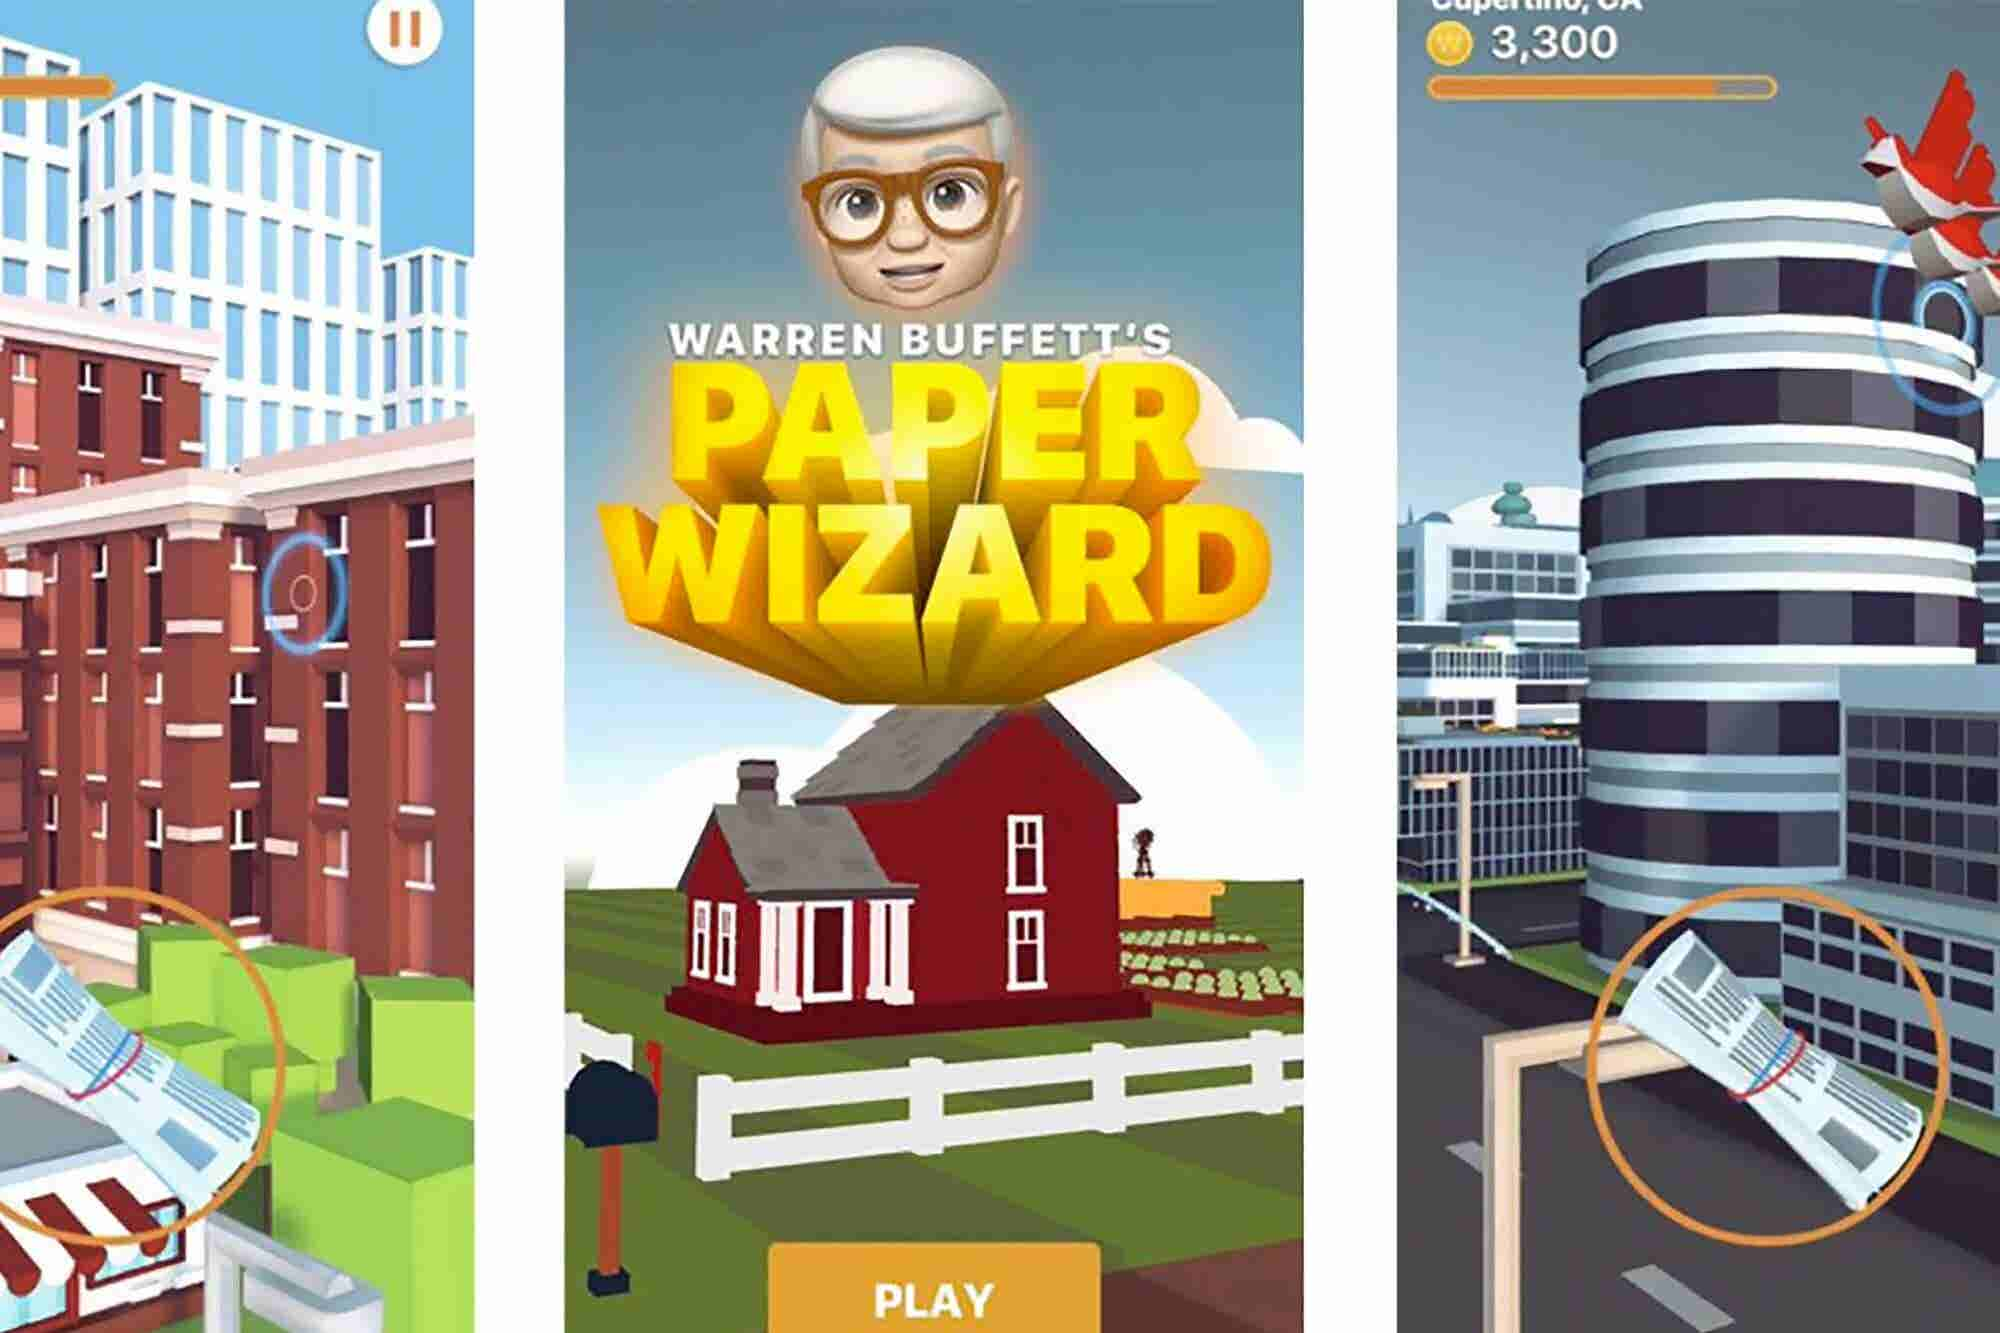 Apple's First iPhone Game in Over a Decade Stars Warren Buffett